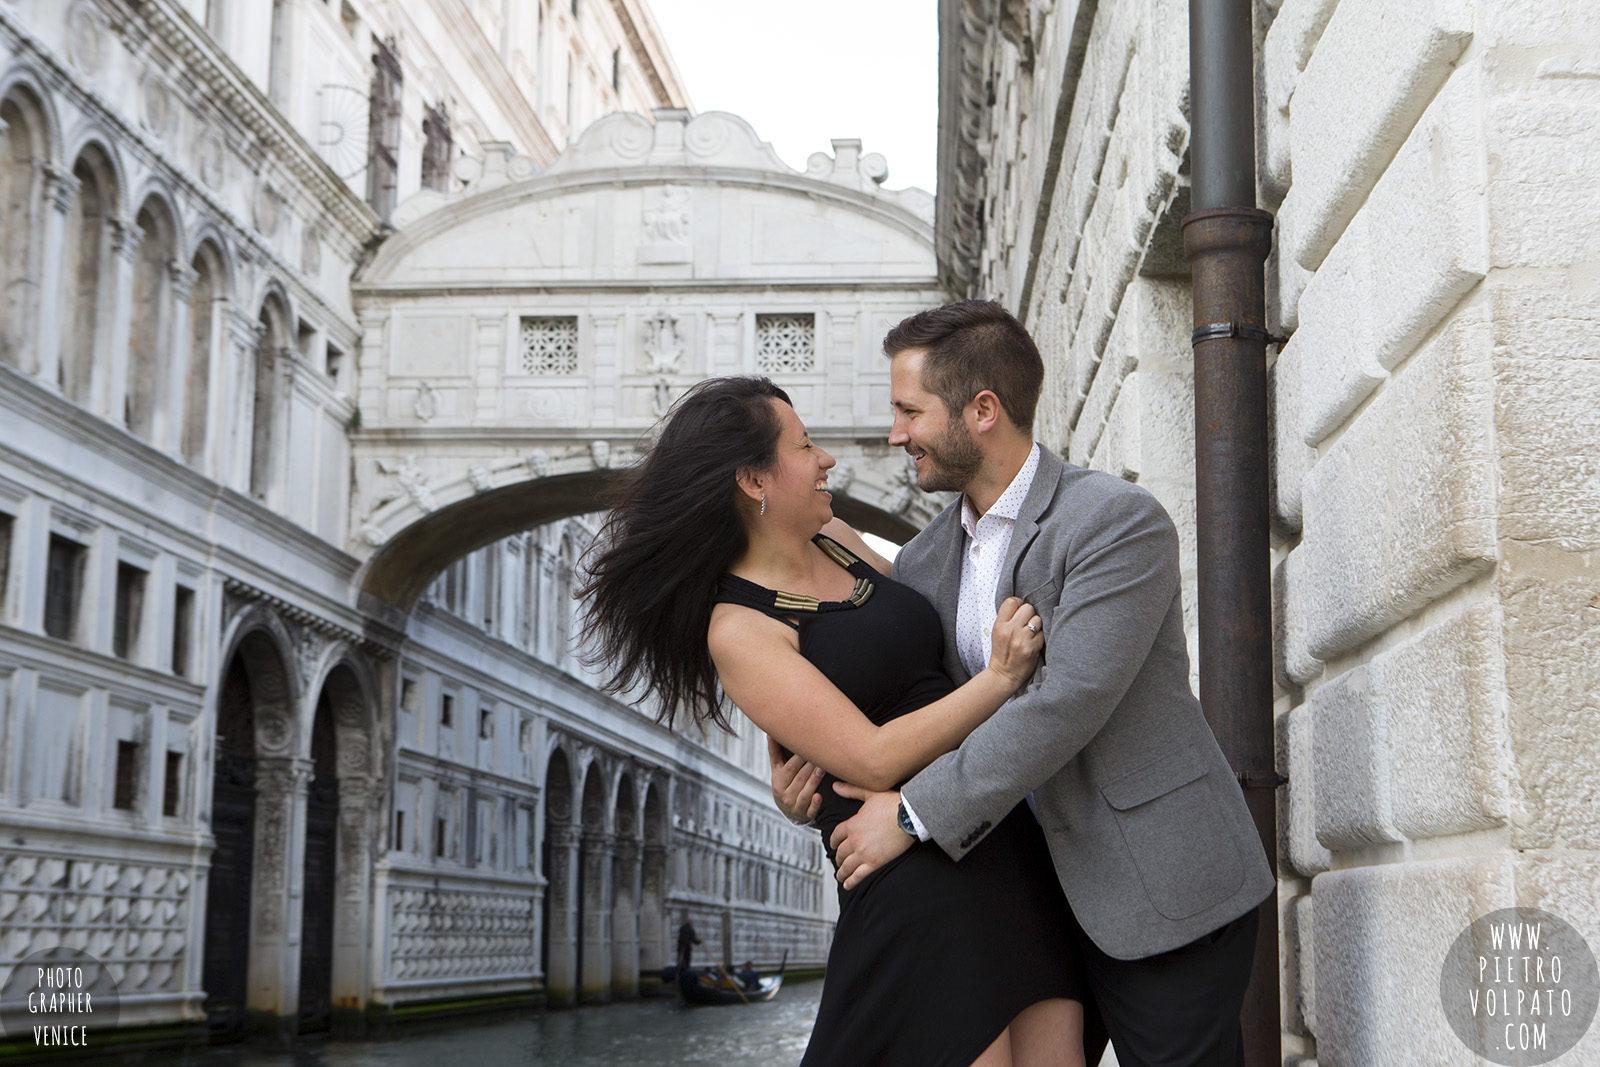 photographer-venice-photoshoot-couple-romantic-vacation-20160417_02